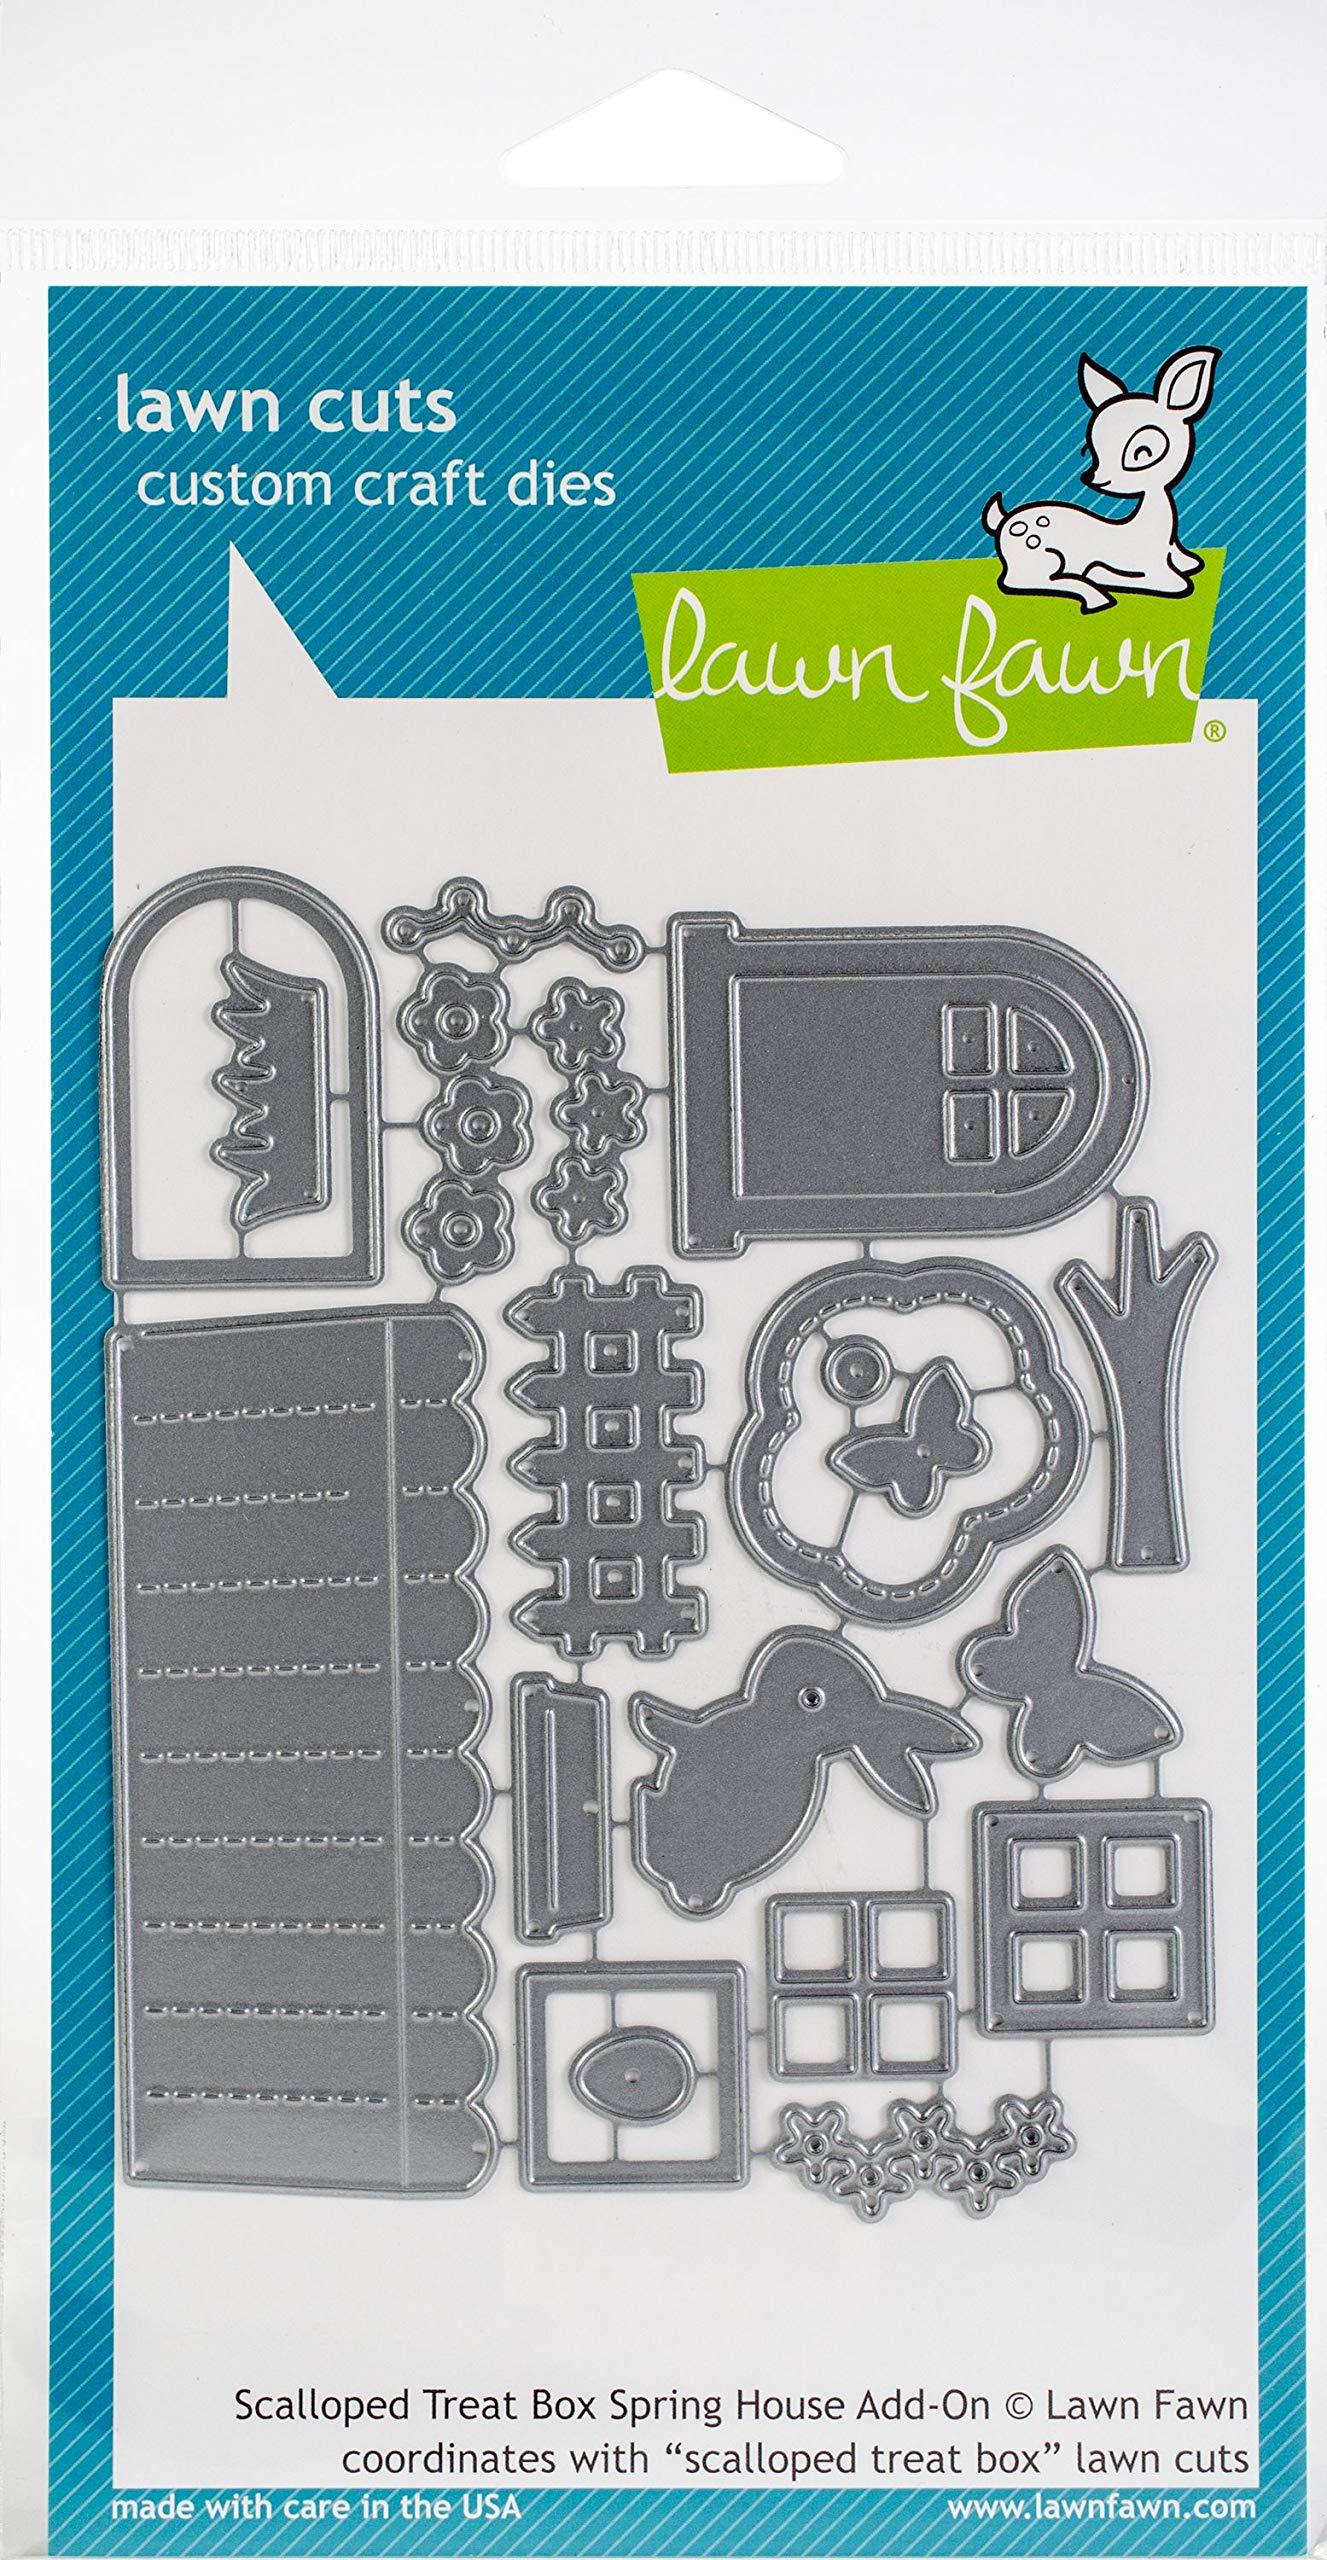 LF1975 Lawn Fawn Scalloped Treat Box Beach House Add-on Custom Craft Die